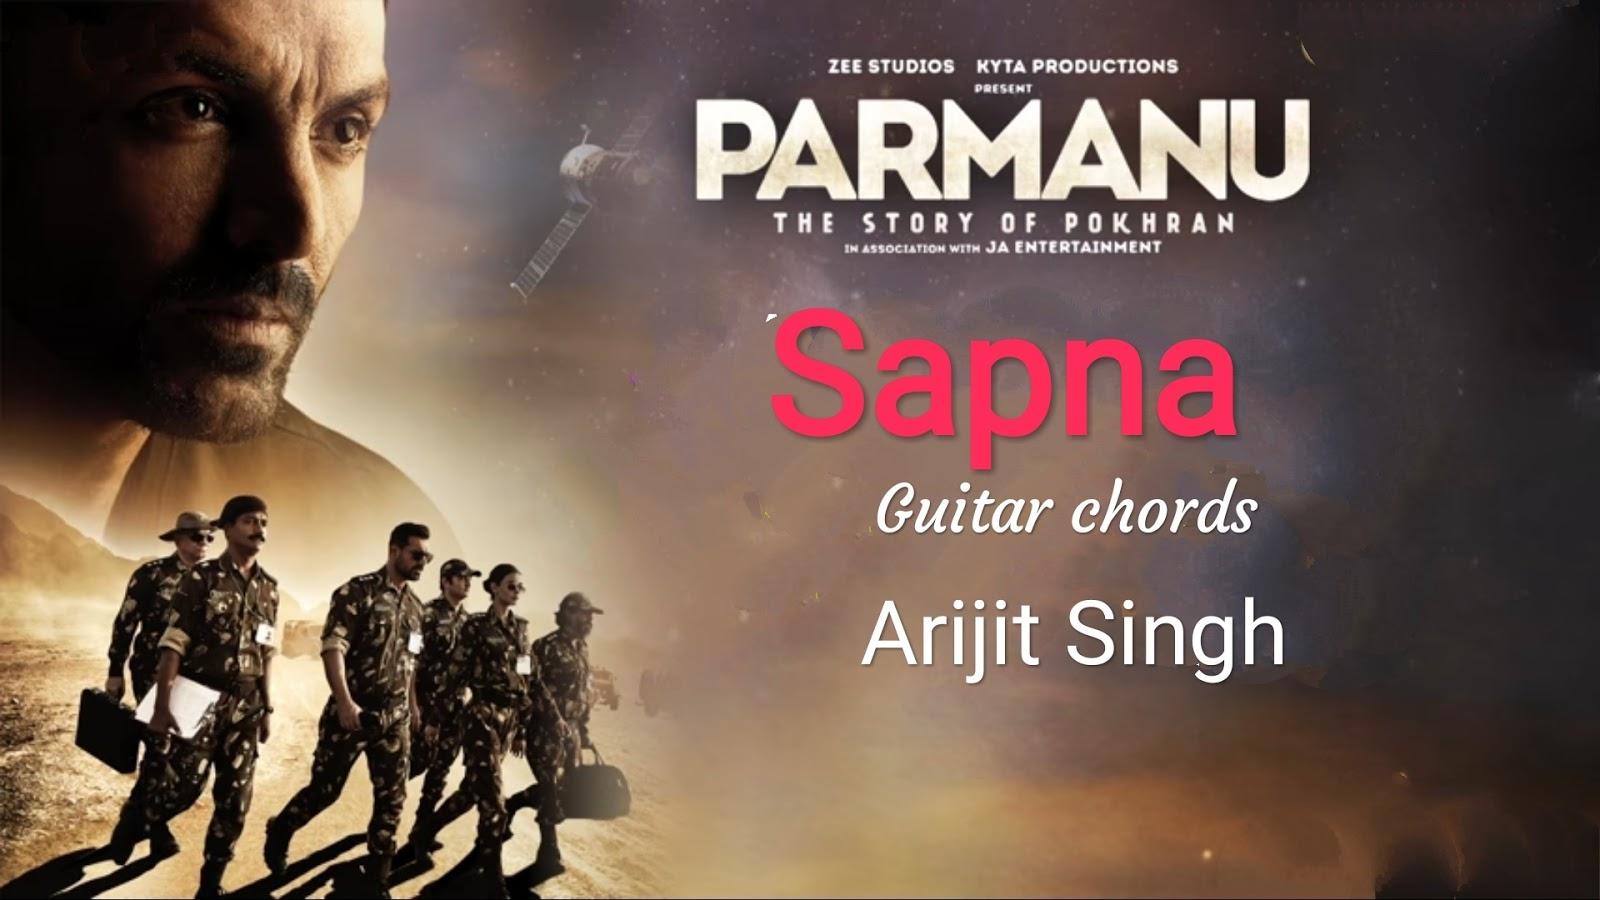 Sapna Guitar Chords Arijit Singh Parmanu The Story Of